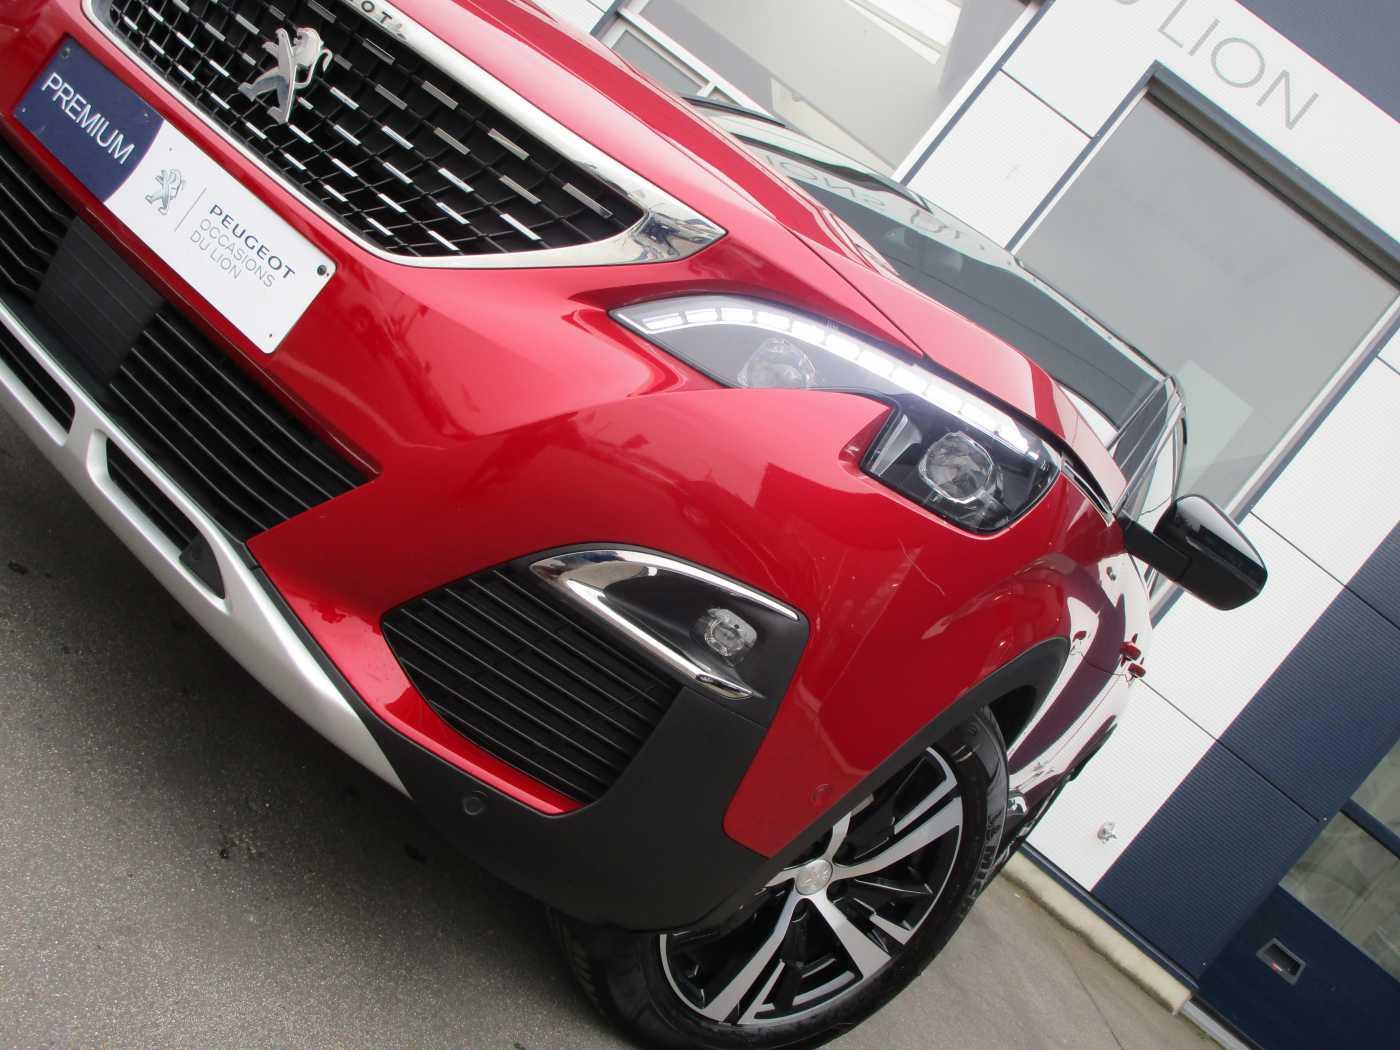 Peugeot 3008 1.2 PureTech GT Line (EU6.2) 9/12